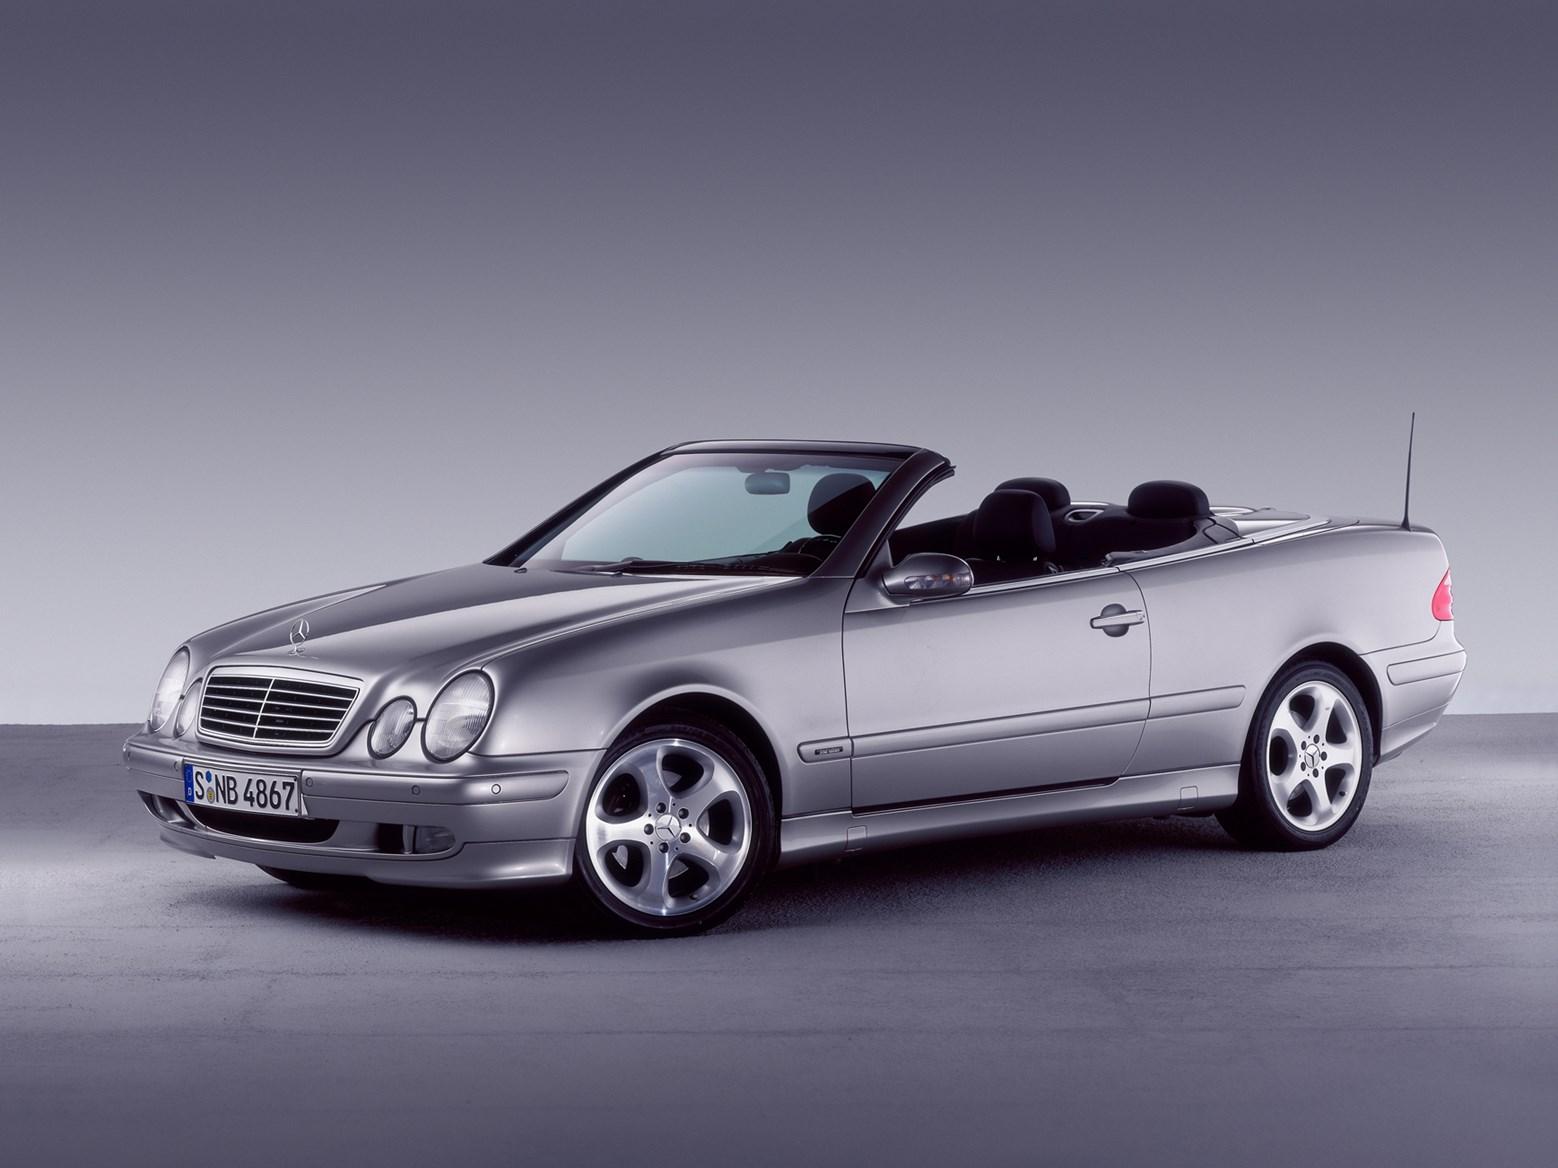 mercedes benz clk cabriolet review 1998 2003 parkers. Black Bedroom Furniture Sets. Home Design Ideas